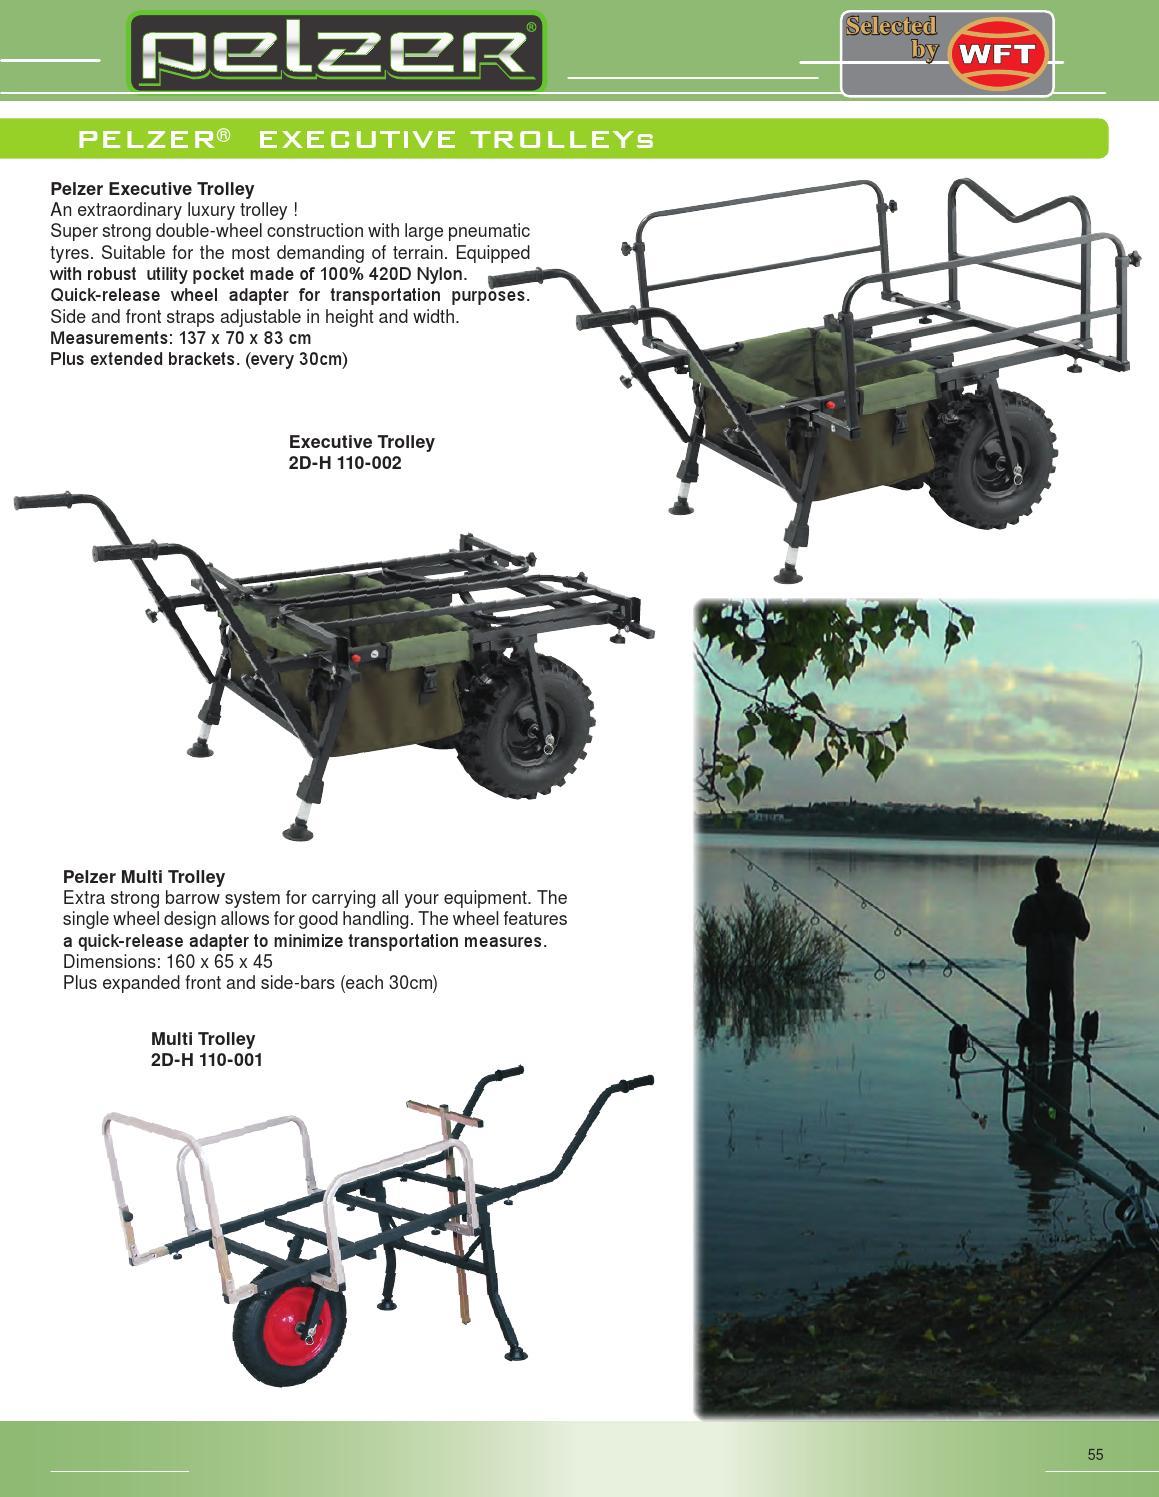 Pelzer Executive Trolley Two Wheels